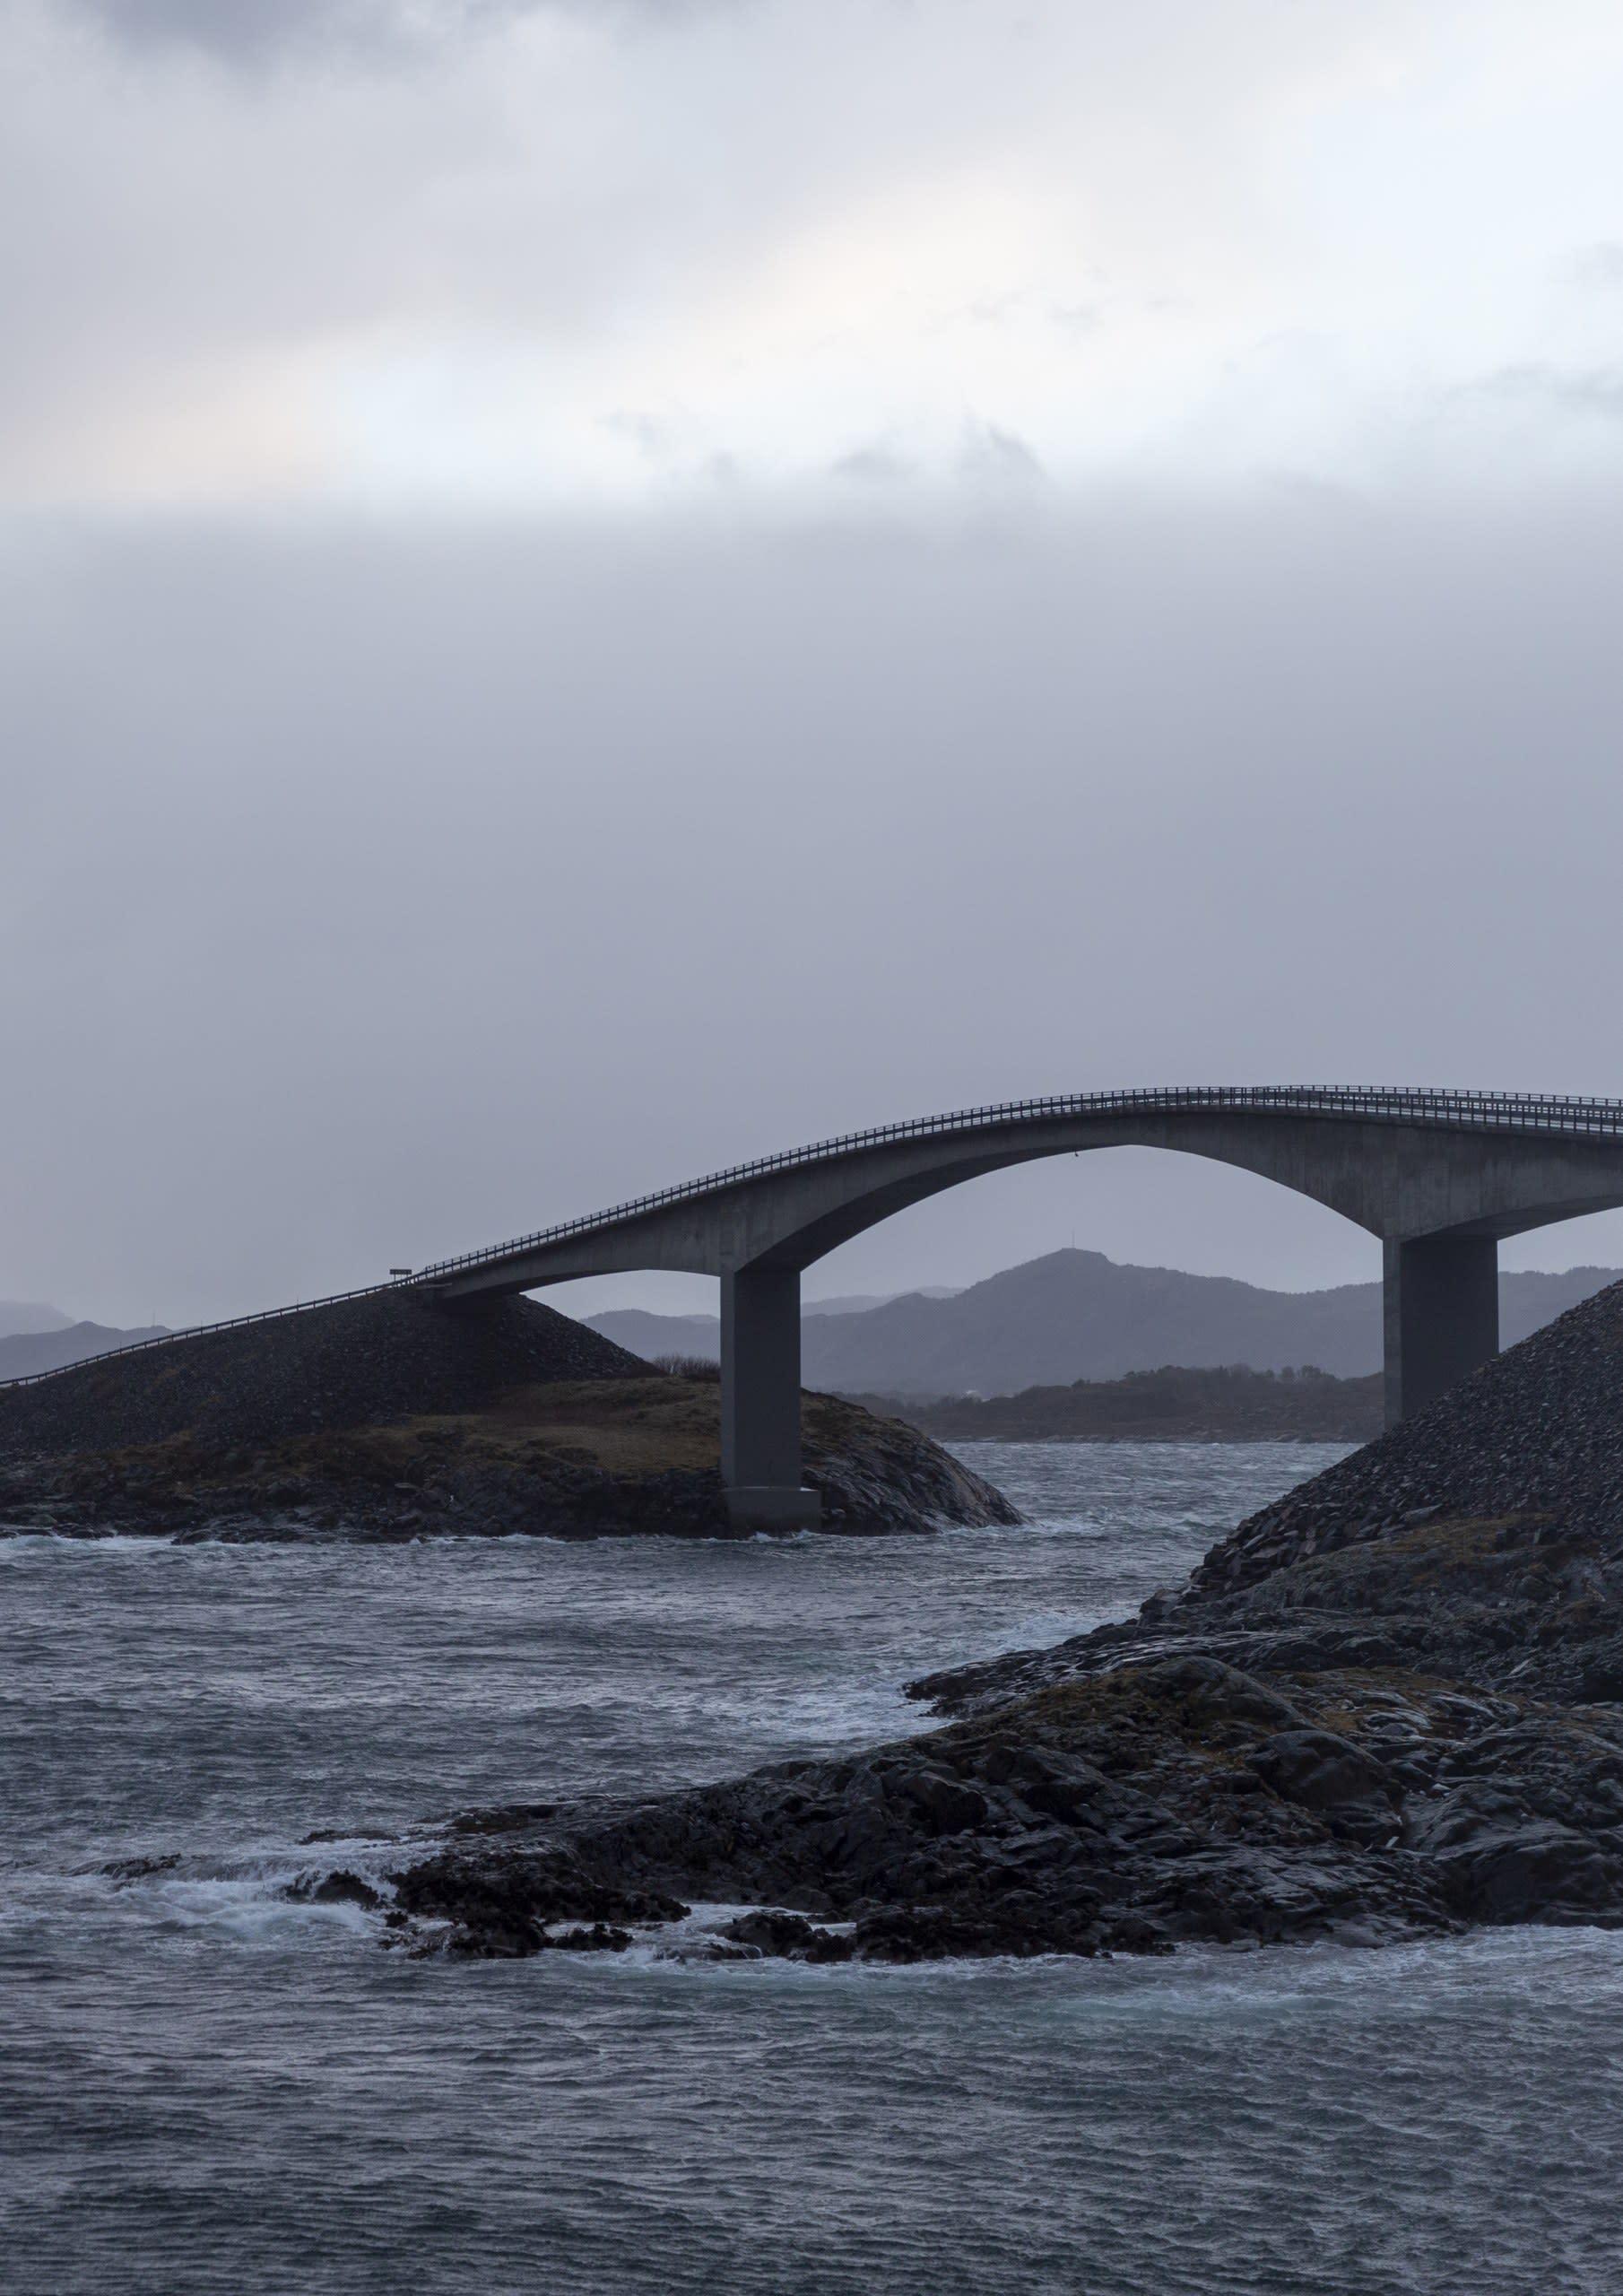 Atlanterhavsveien (The Atlantic Ocean Road)